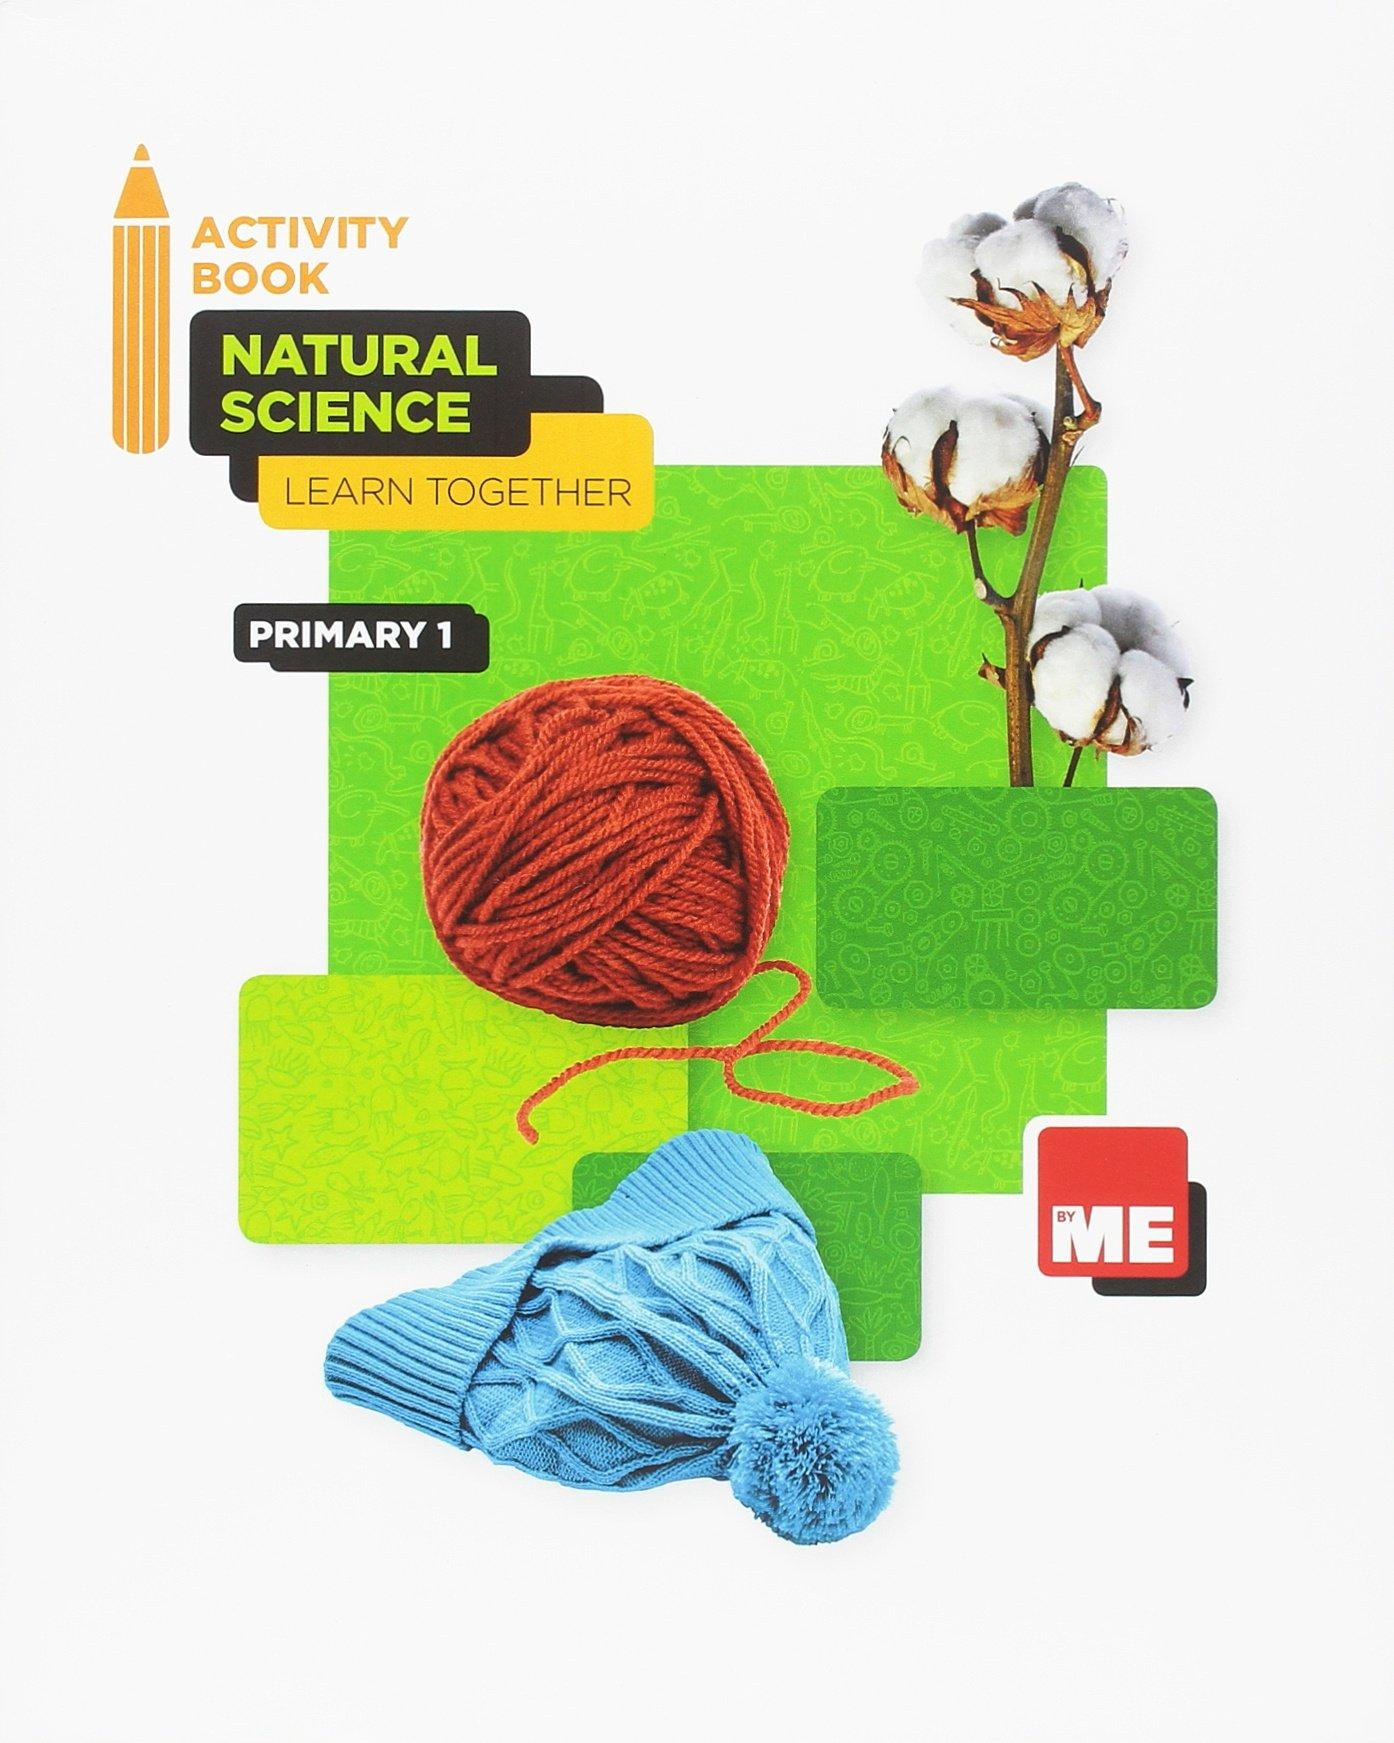 LIBRO DE TEXTO - 1 PRIMARIA NATURAL SCIENCE ACTIVITY BOOK - LEARN TOGETHER